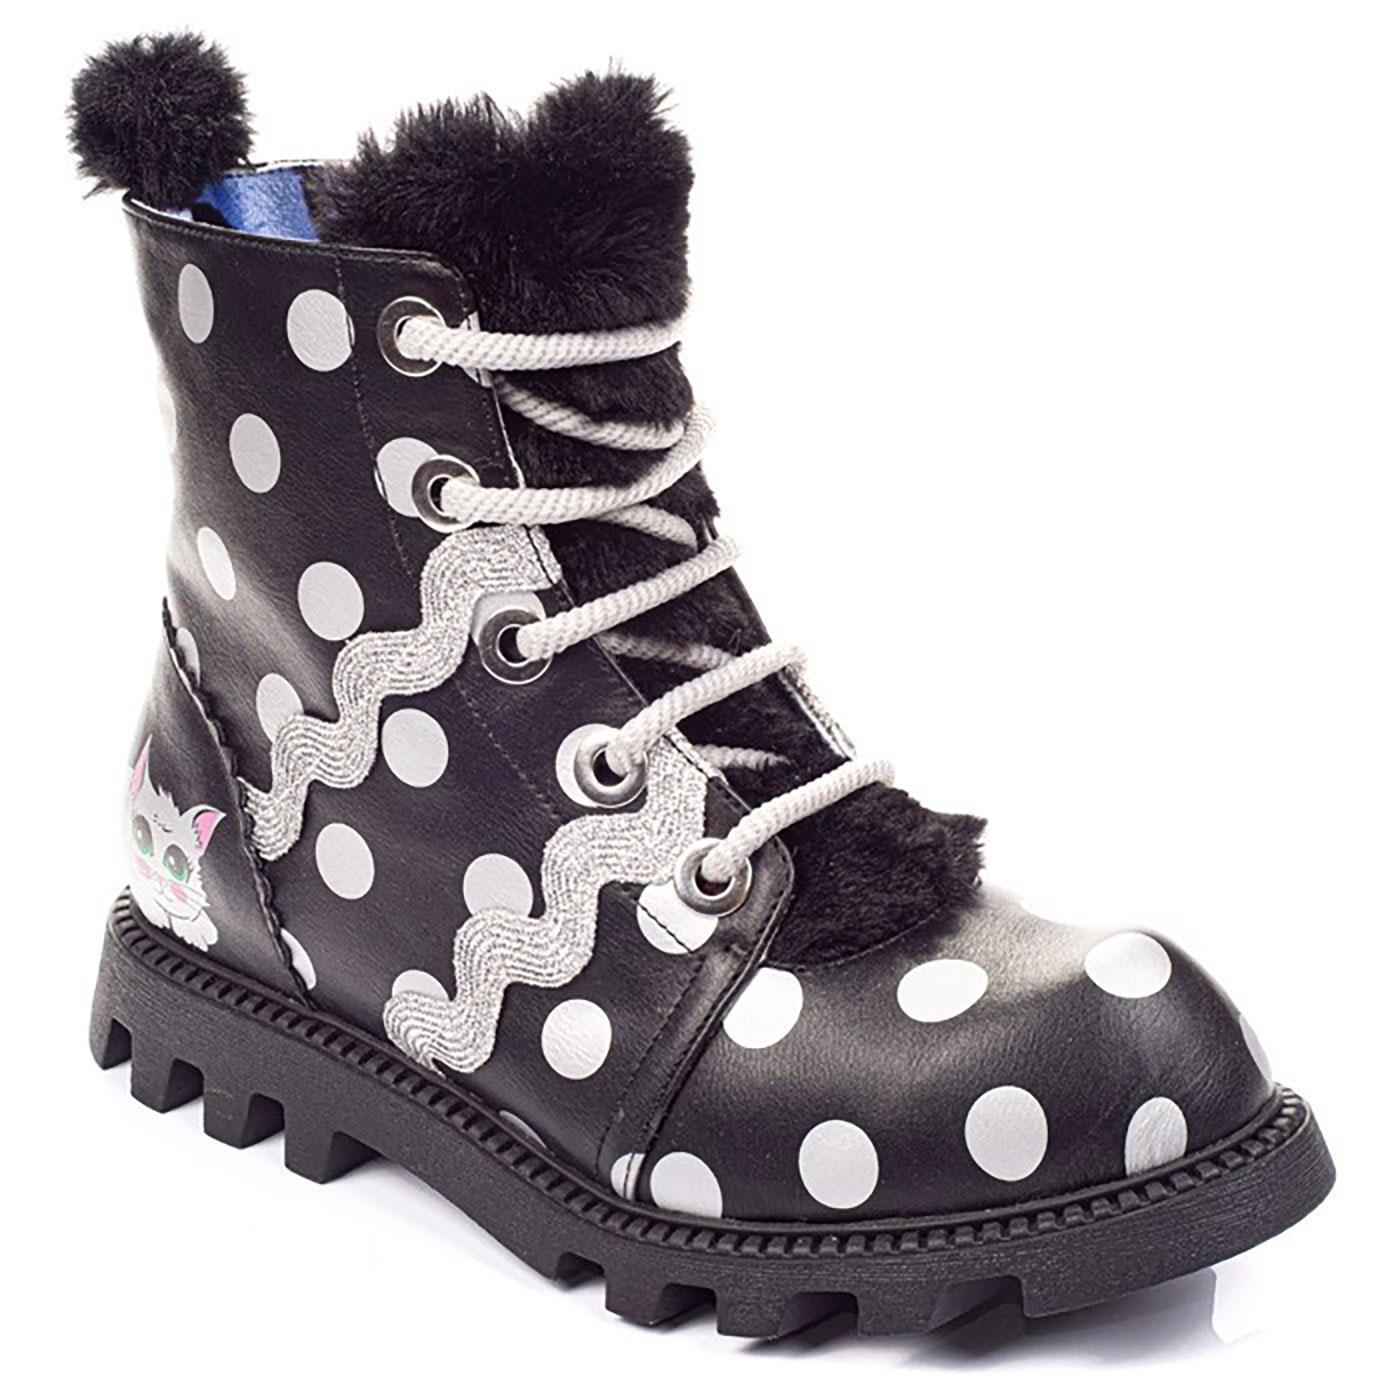 Lexie IRREGULAR CHOICE Kitten Polka Dot Boots